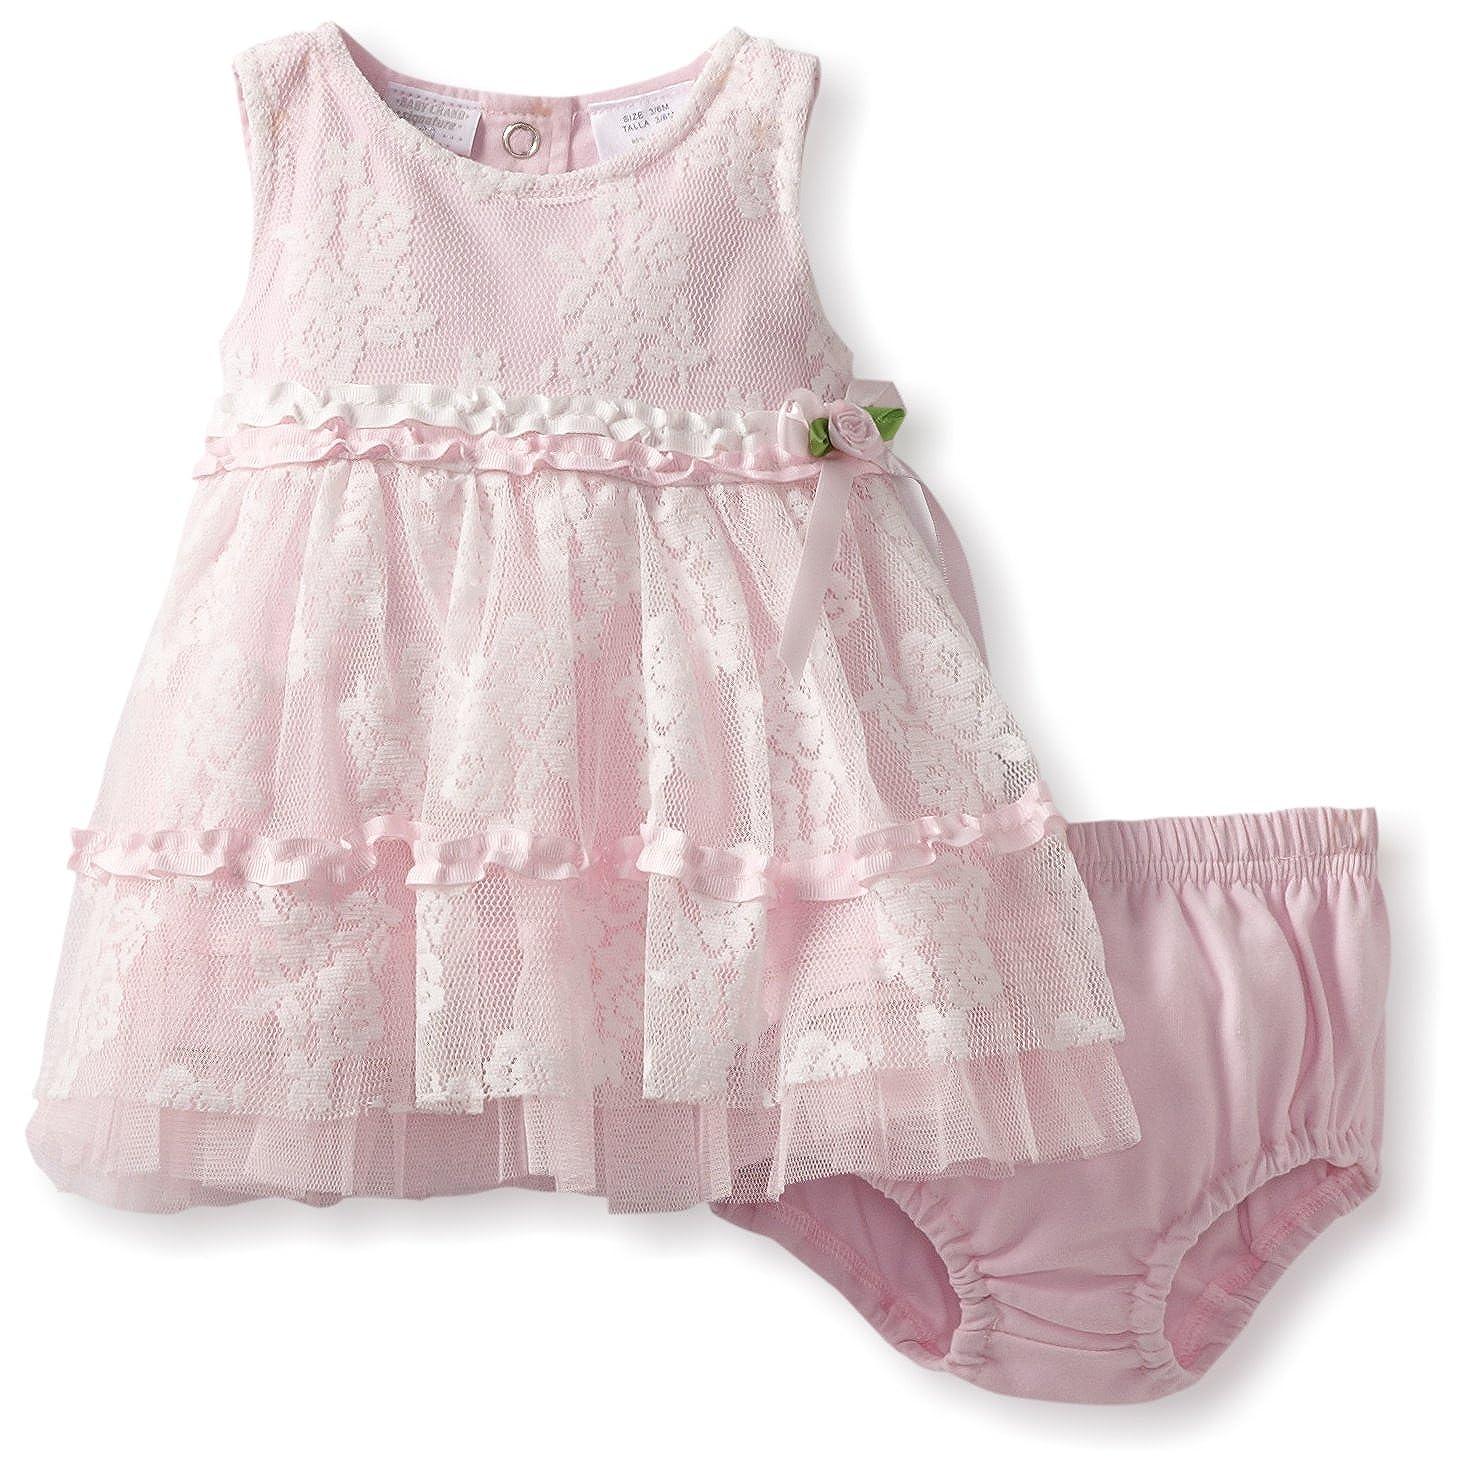 Baby Grand Signature Girls Dress 6-9 months